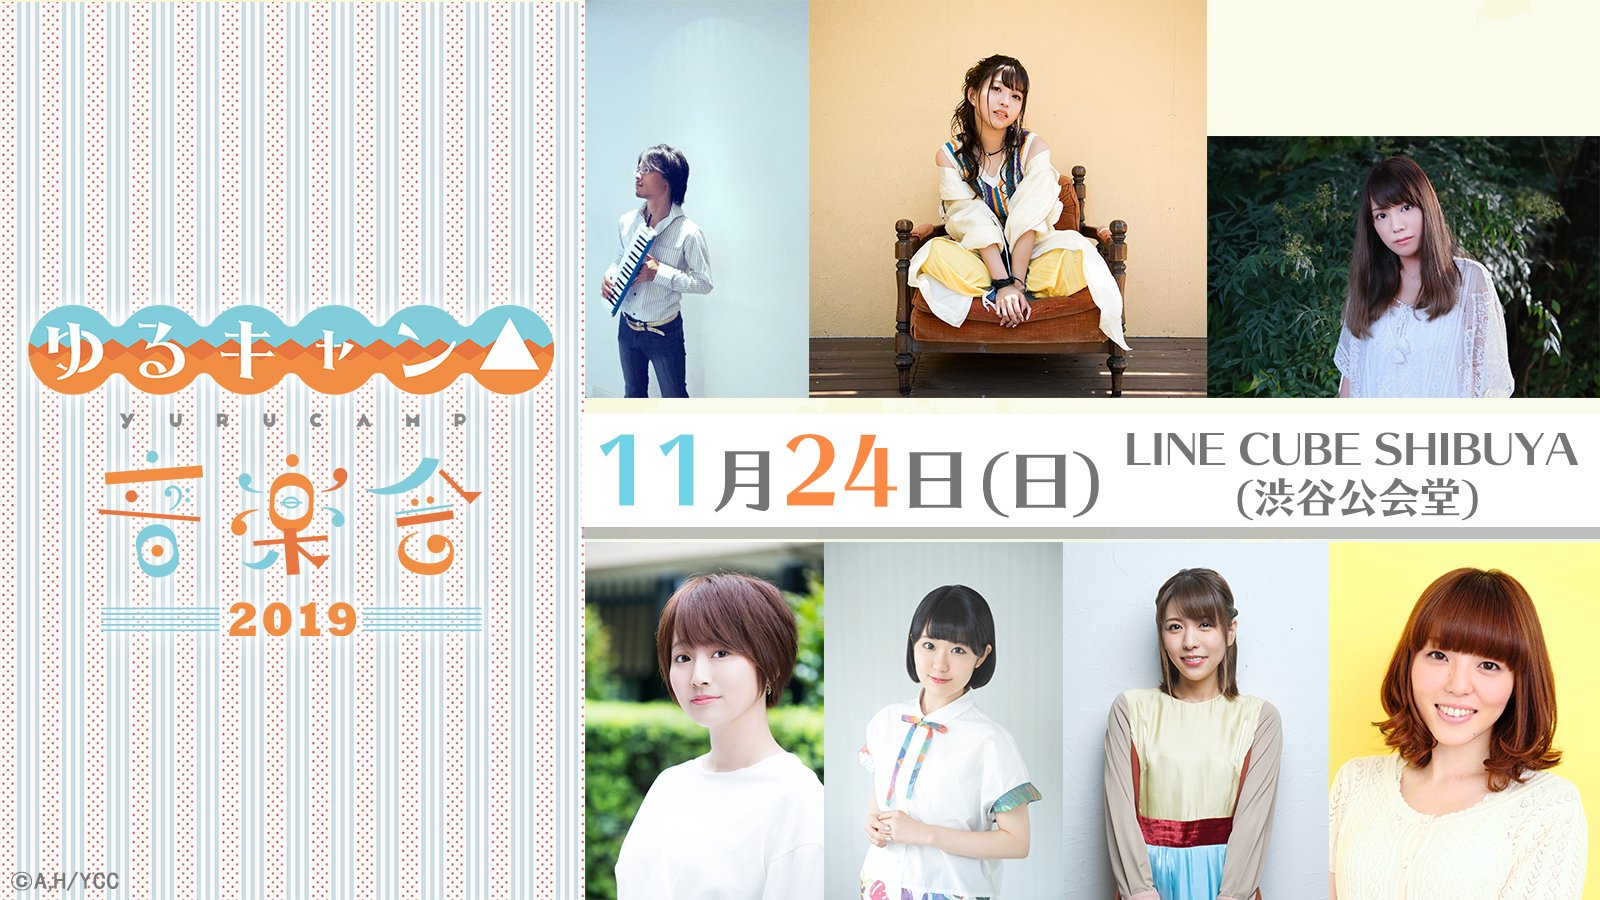 yurucamp_anime 1195266947765559296_p0